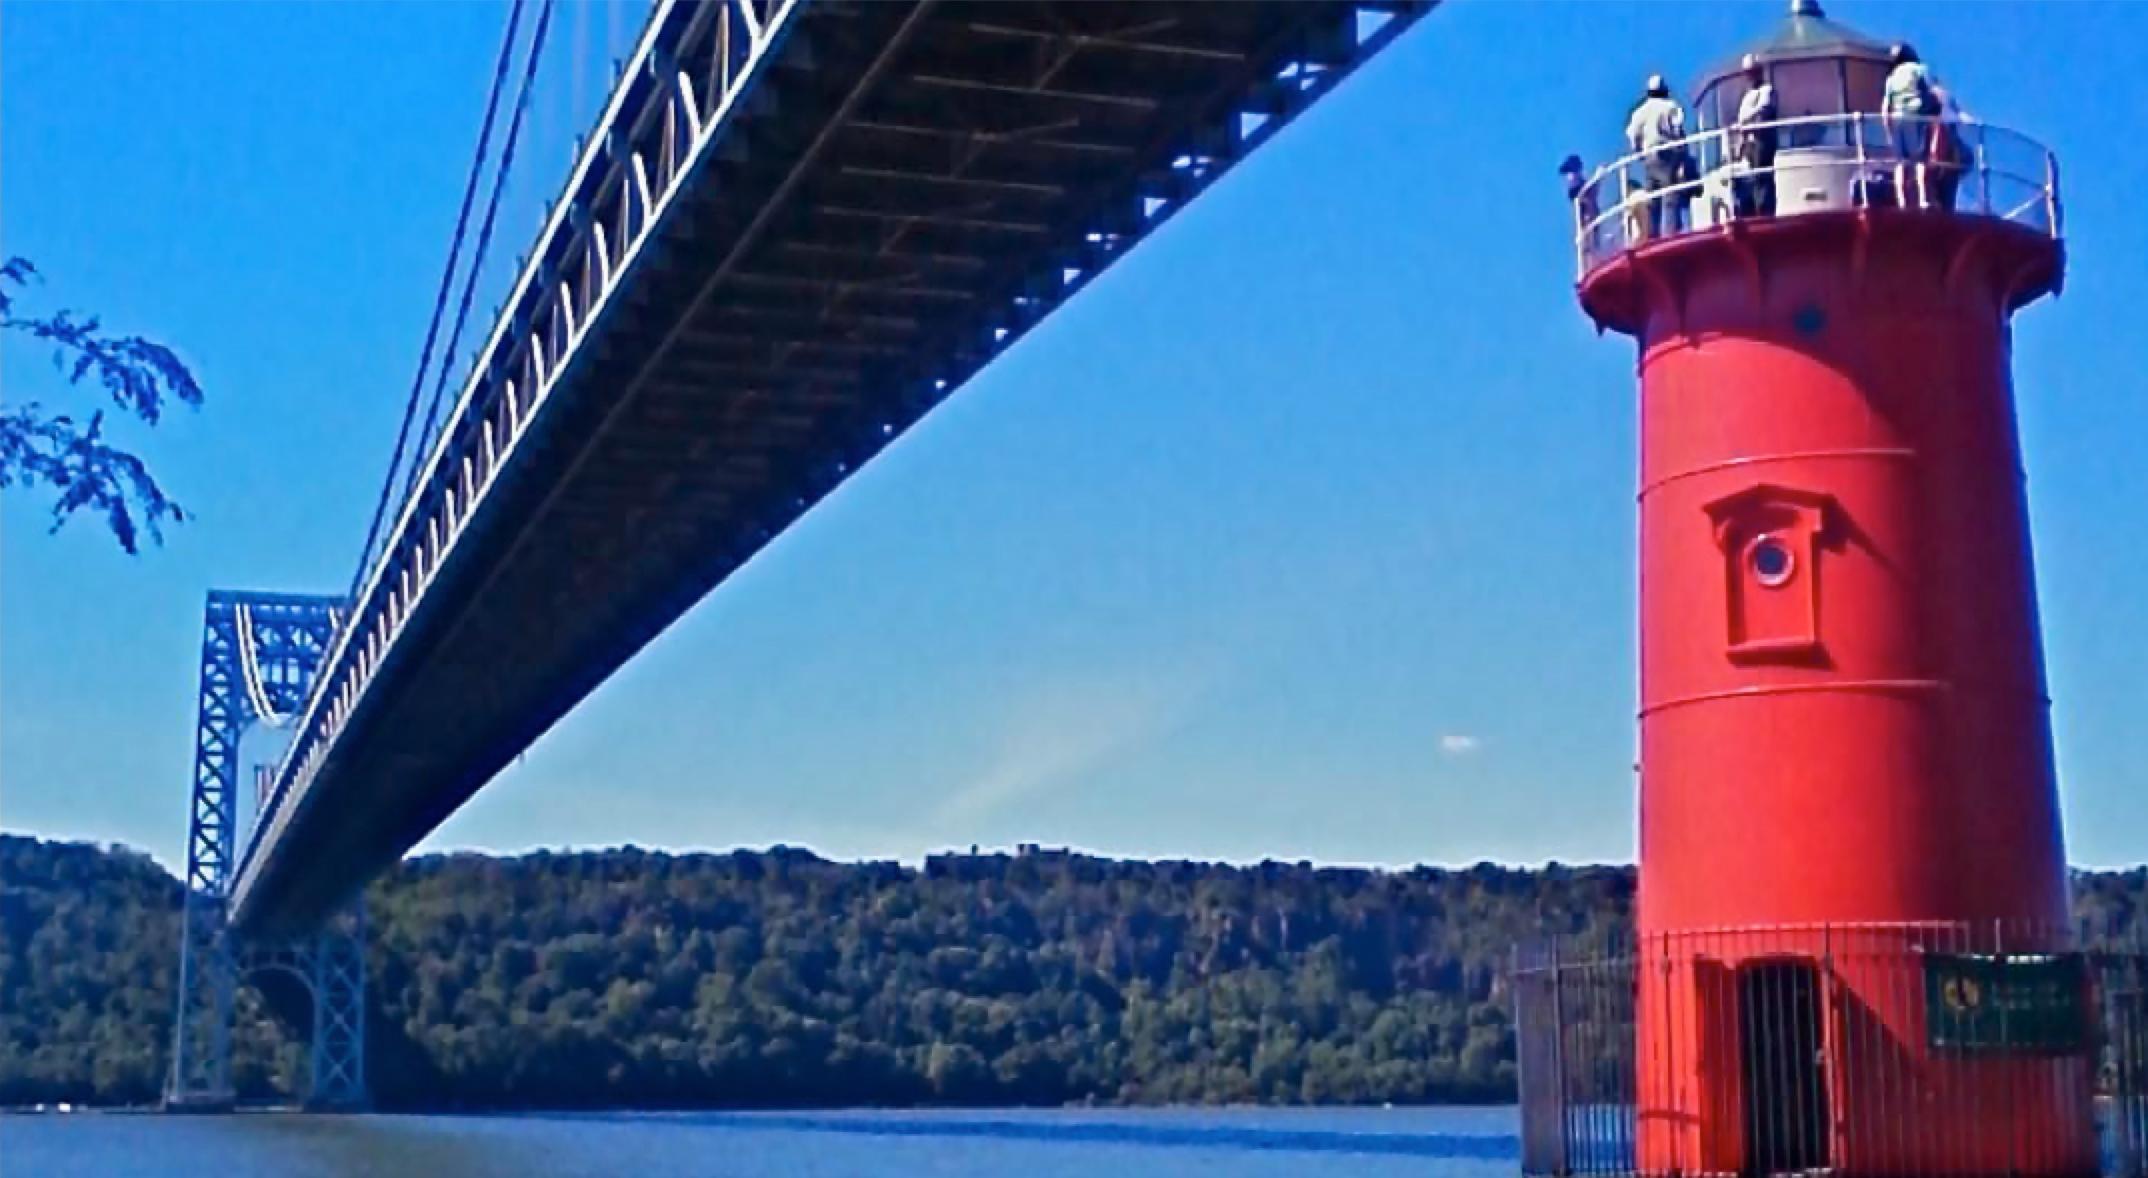 Little Red Lighthouse, under the George Washington Bridge, New York City.